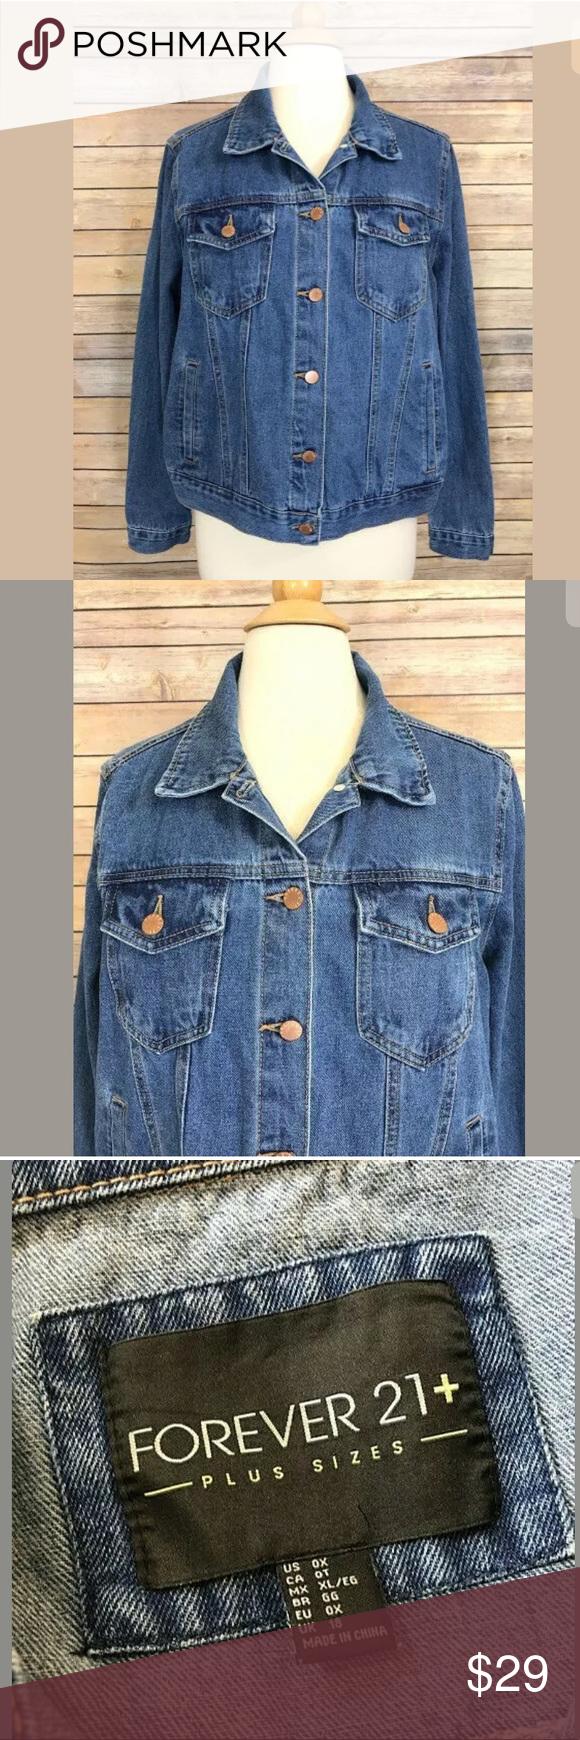 7a8b28fadd7 Forever 21 + Denim Blue Jean Jacket Plus Size 0X Forever 21 + Jean Jacket  Women s Plus Size 0X 100% Cotton Denim Button down front Length   23